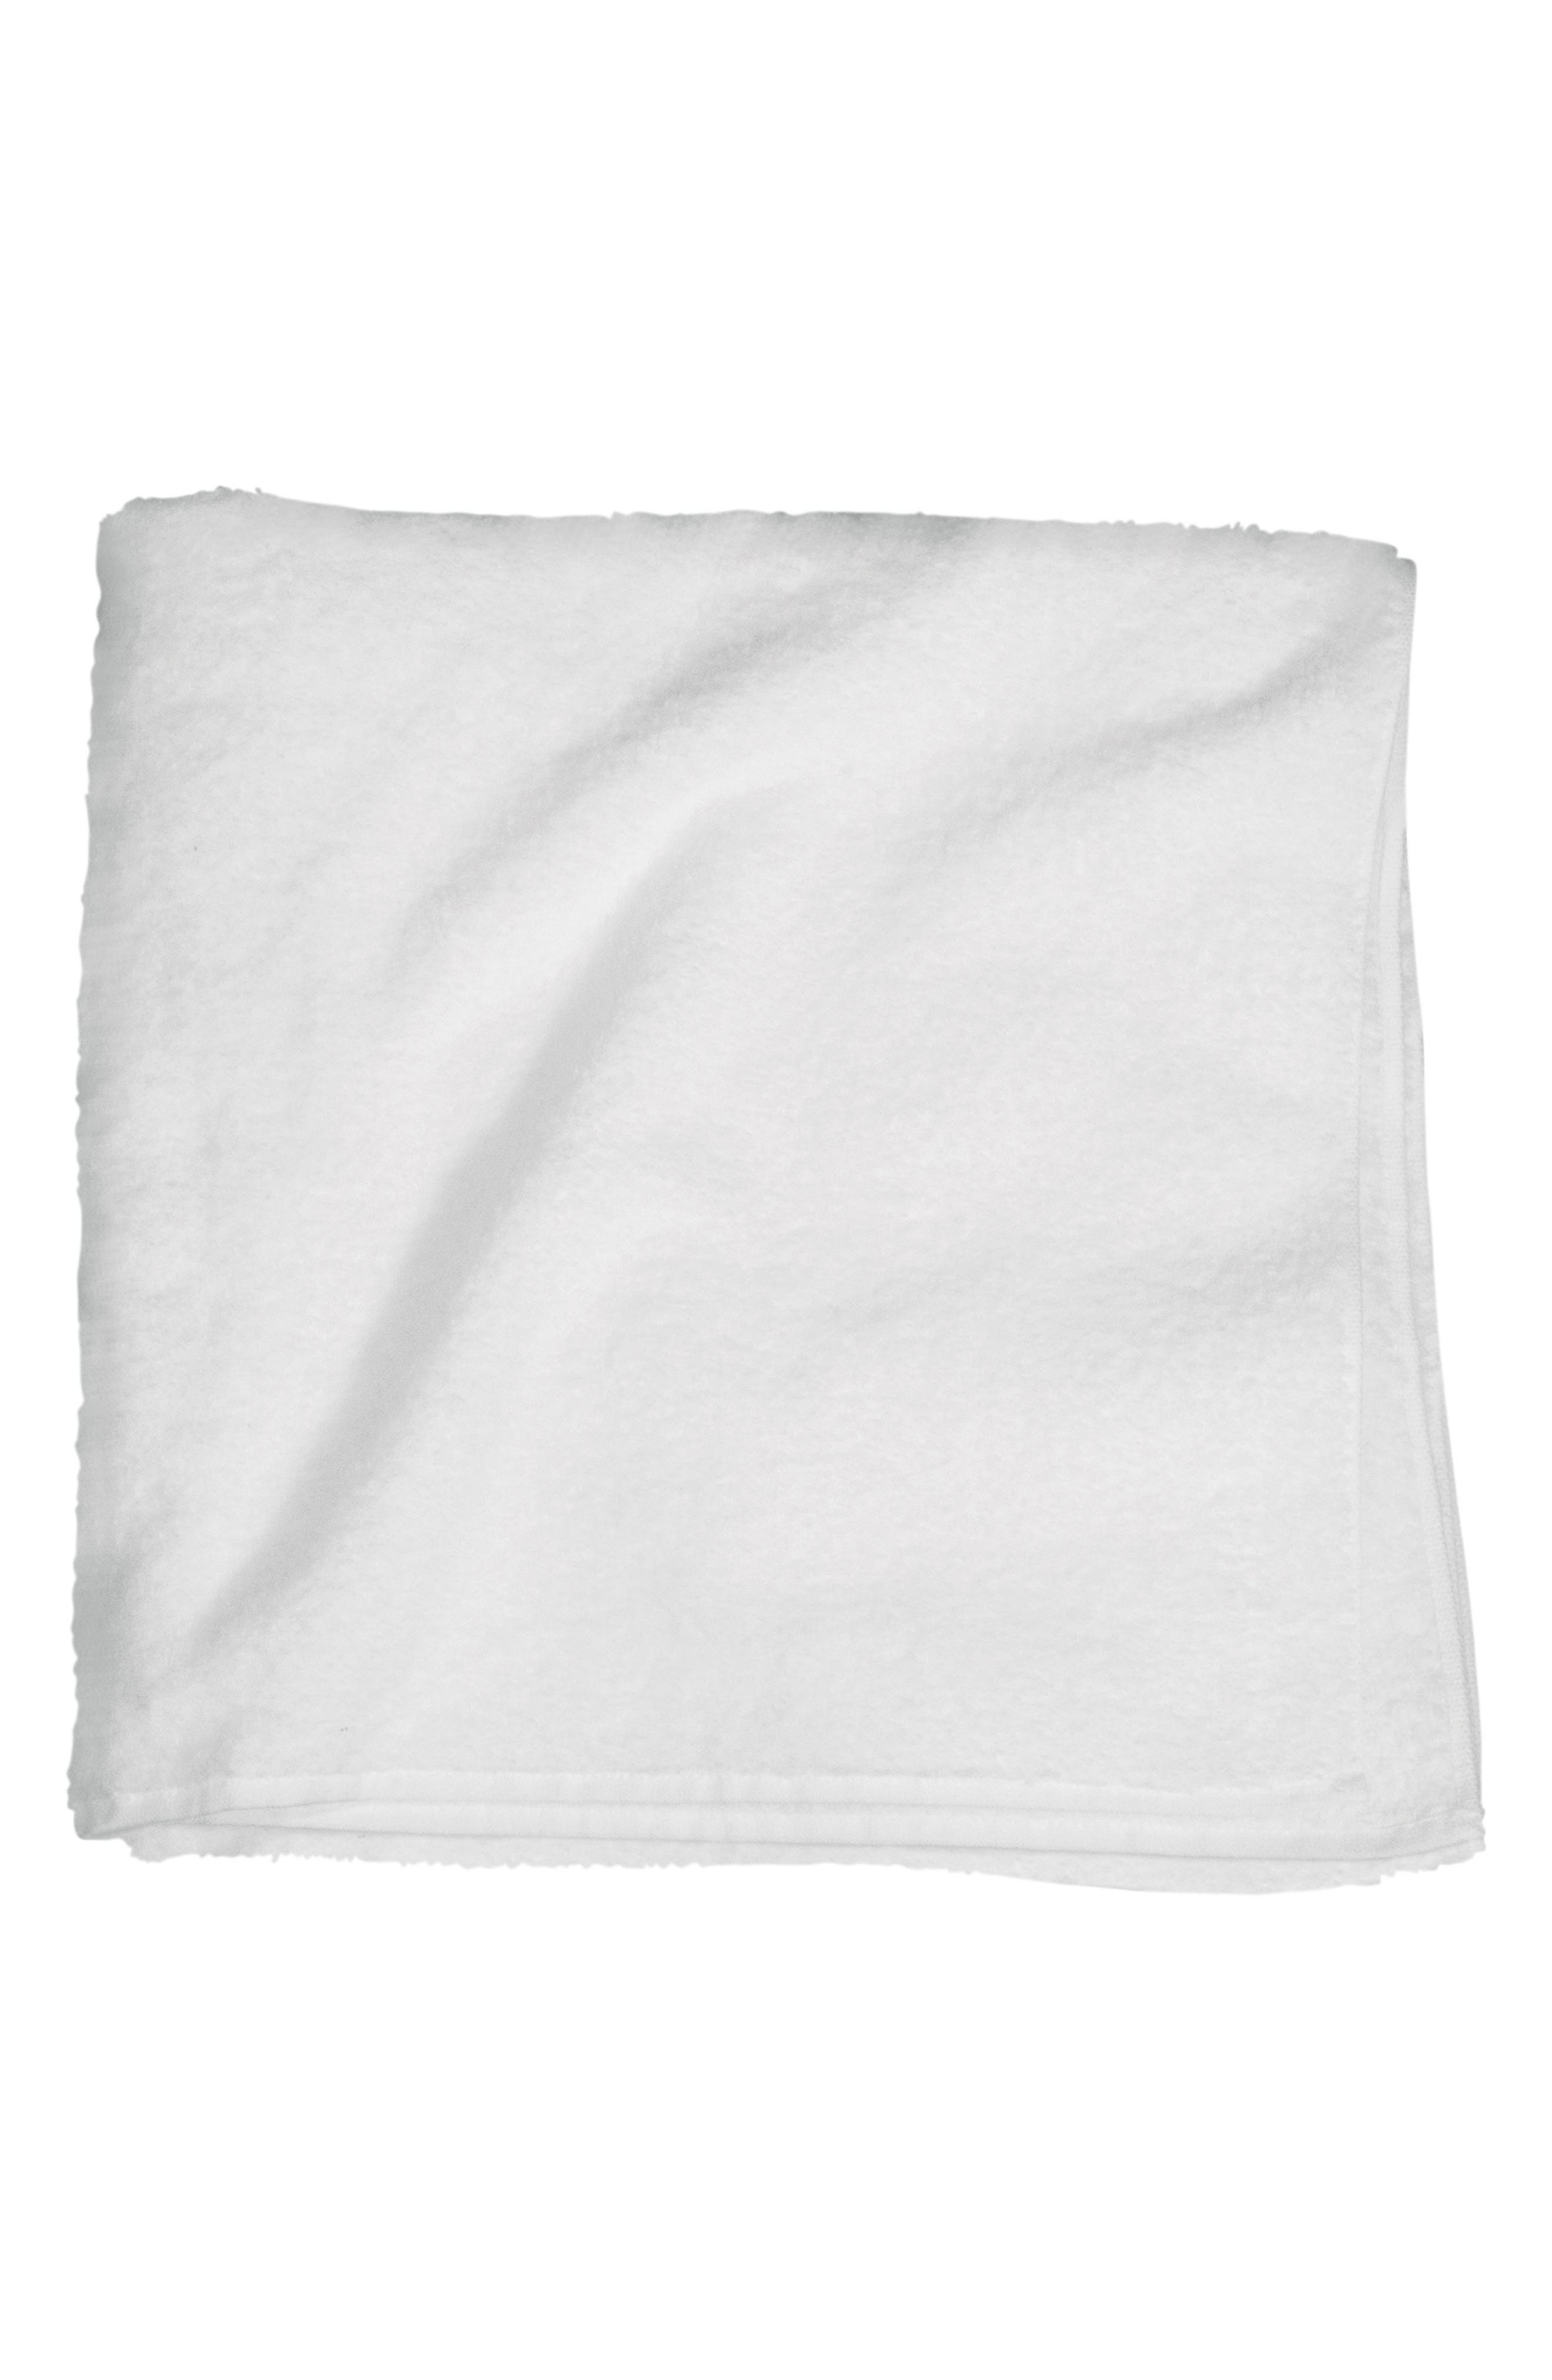 Zero Twist Bath Towel,                             Main thumbnail 1, color,                             WHITE